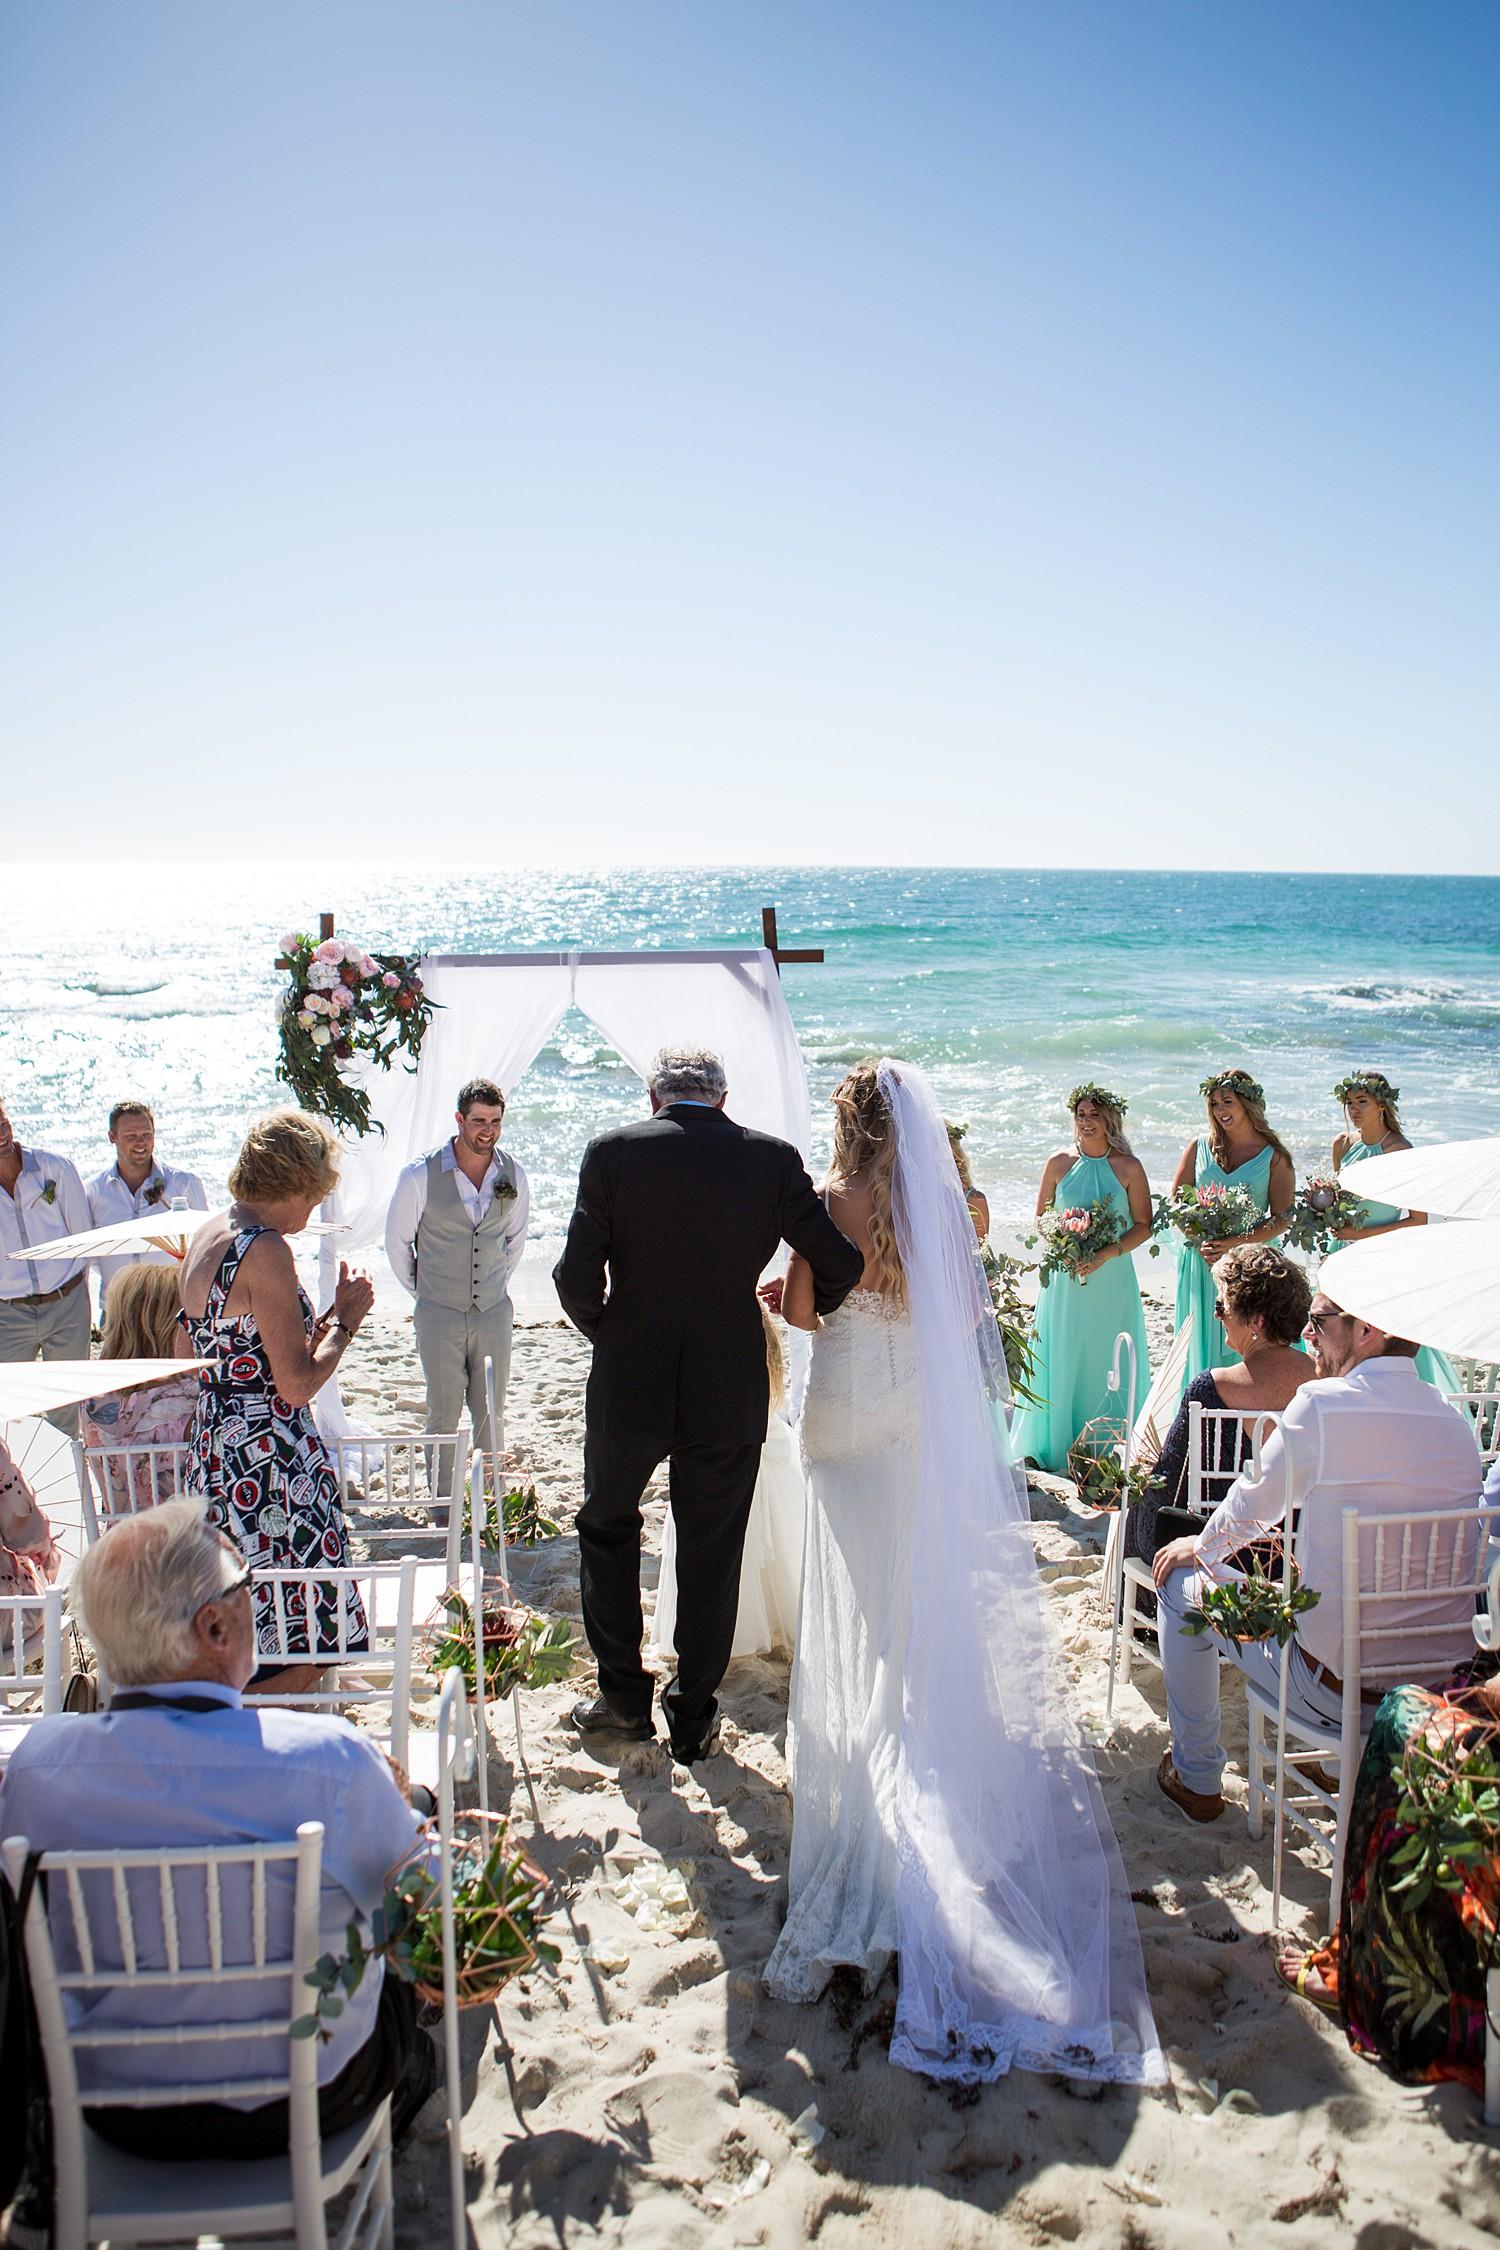 trigg_beach_wedding_perth (29).jpg